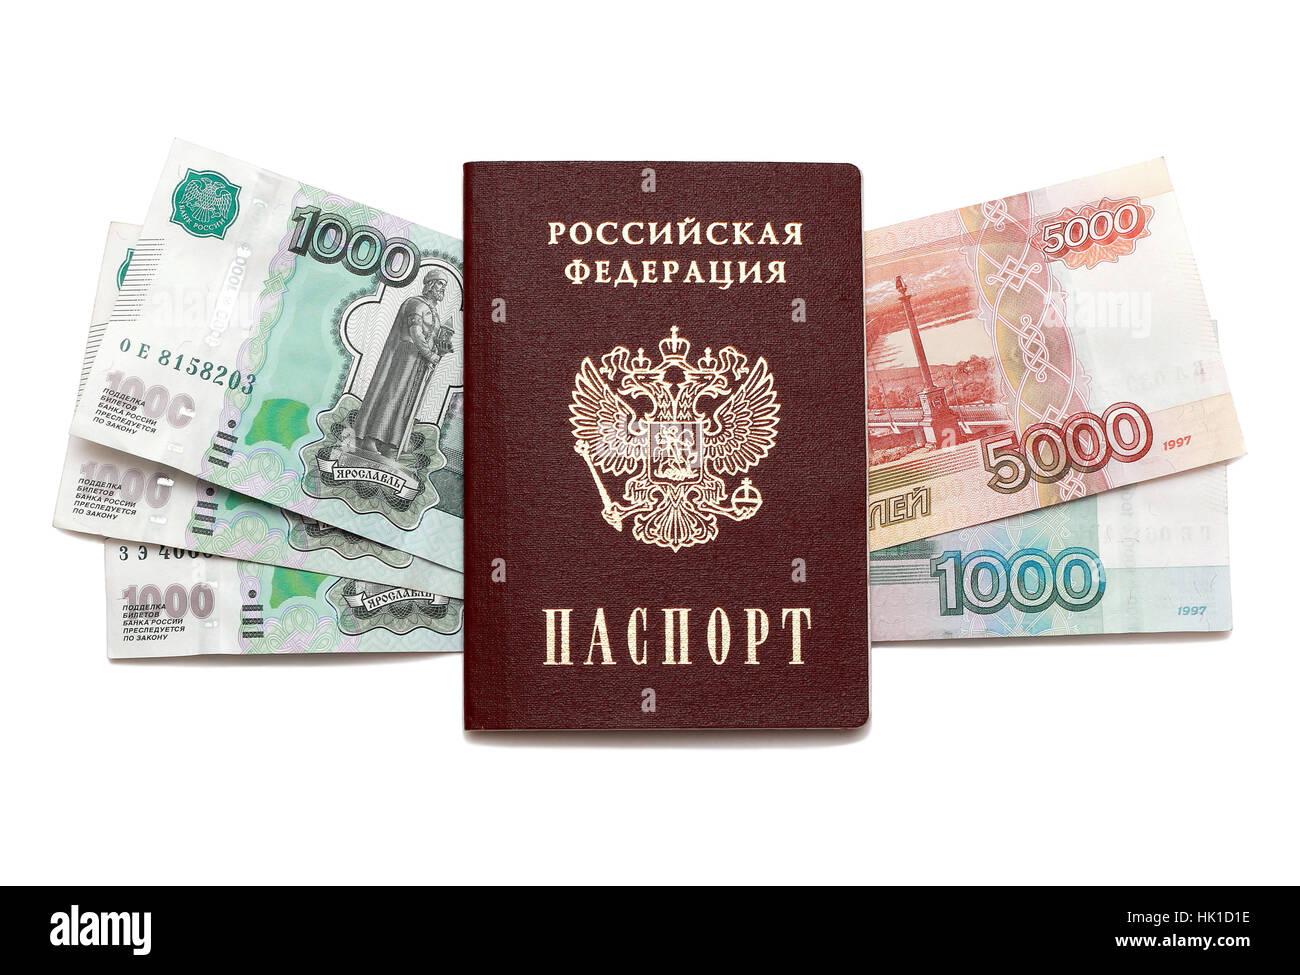 микрозайм на карту без паспорта